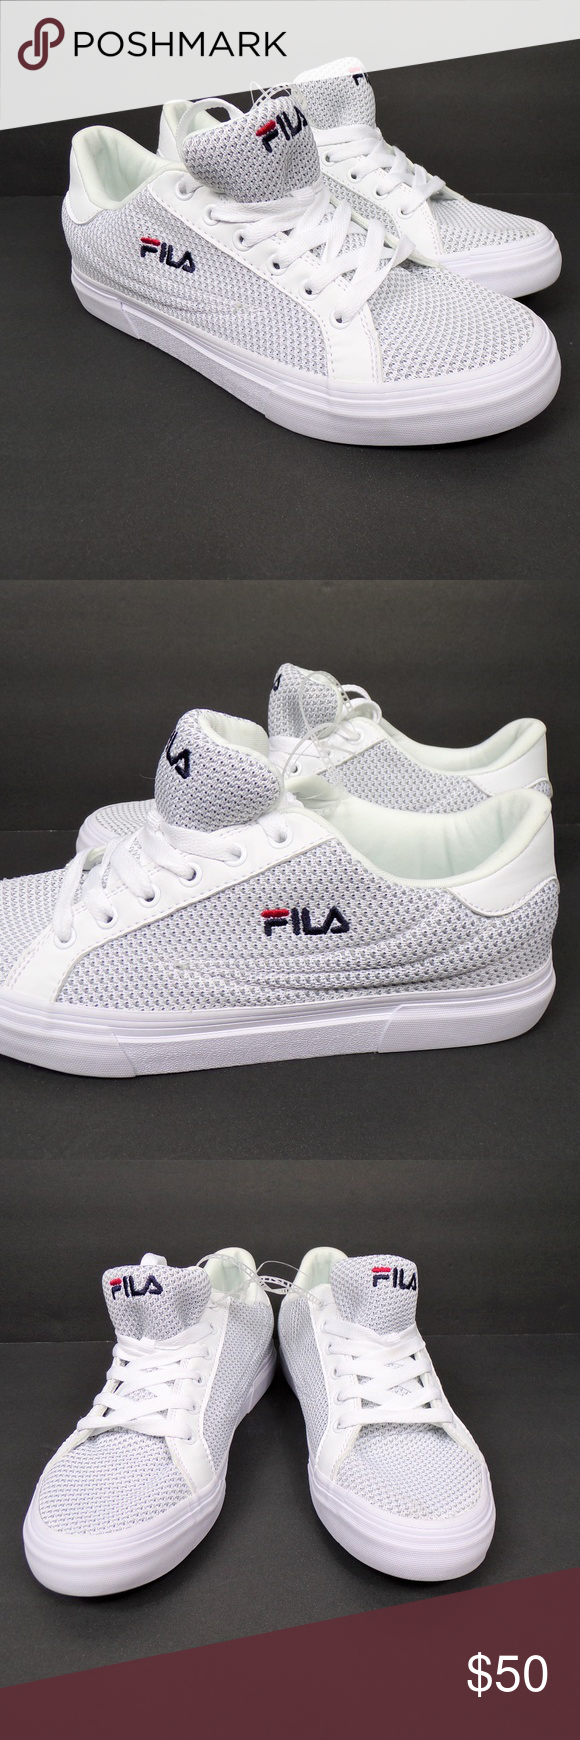 Fila Mens Smash Lite Lace Up Sneakers